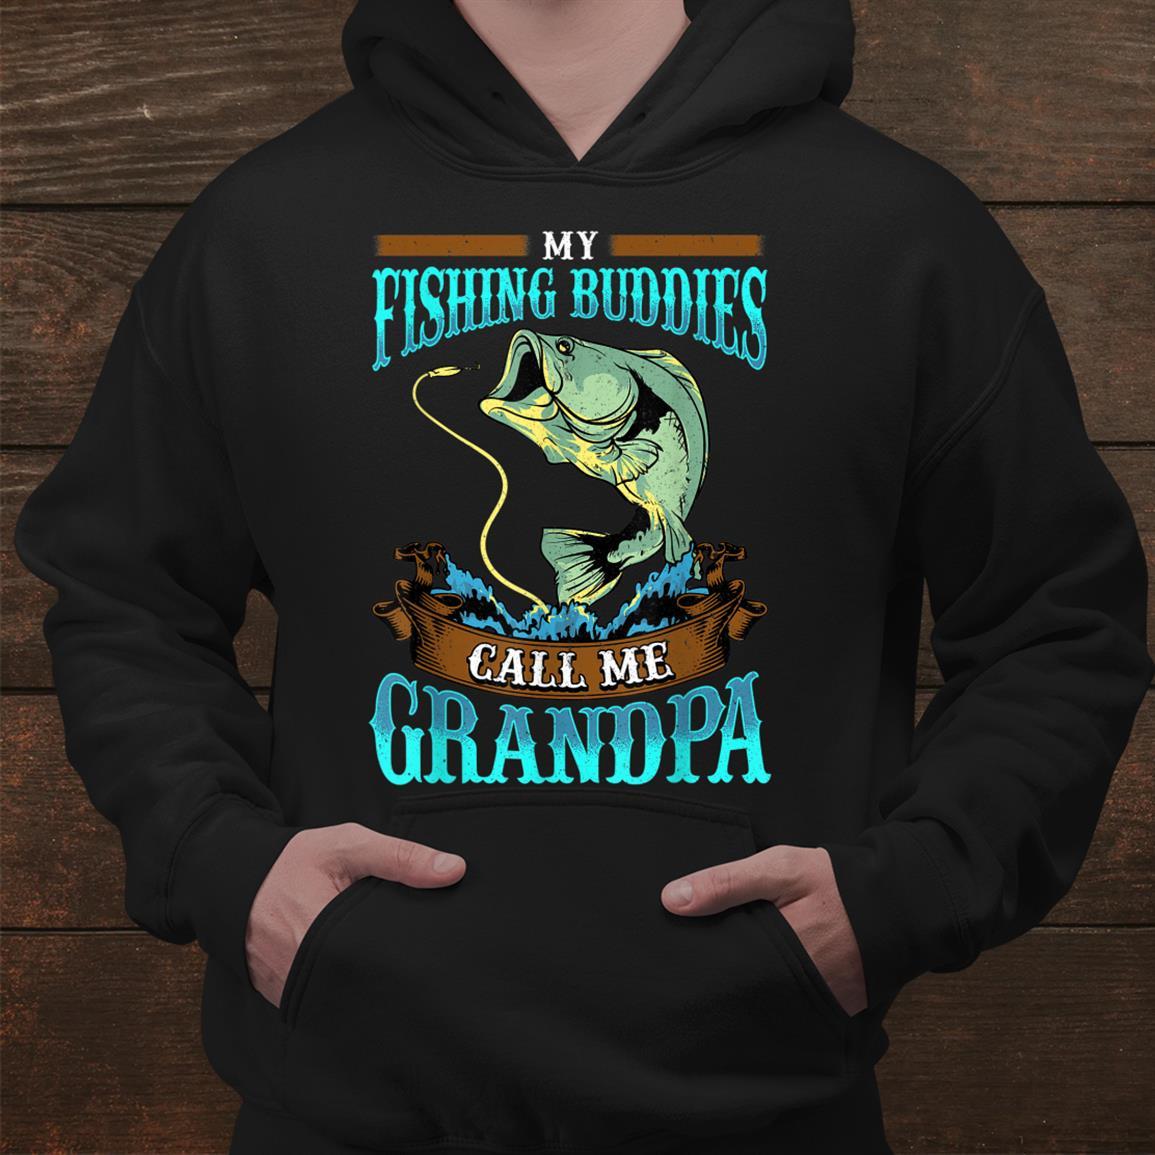 My Fishing Buddies Call Me Grandpa Shirt